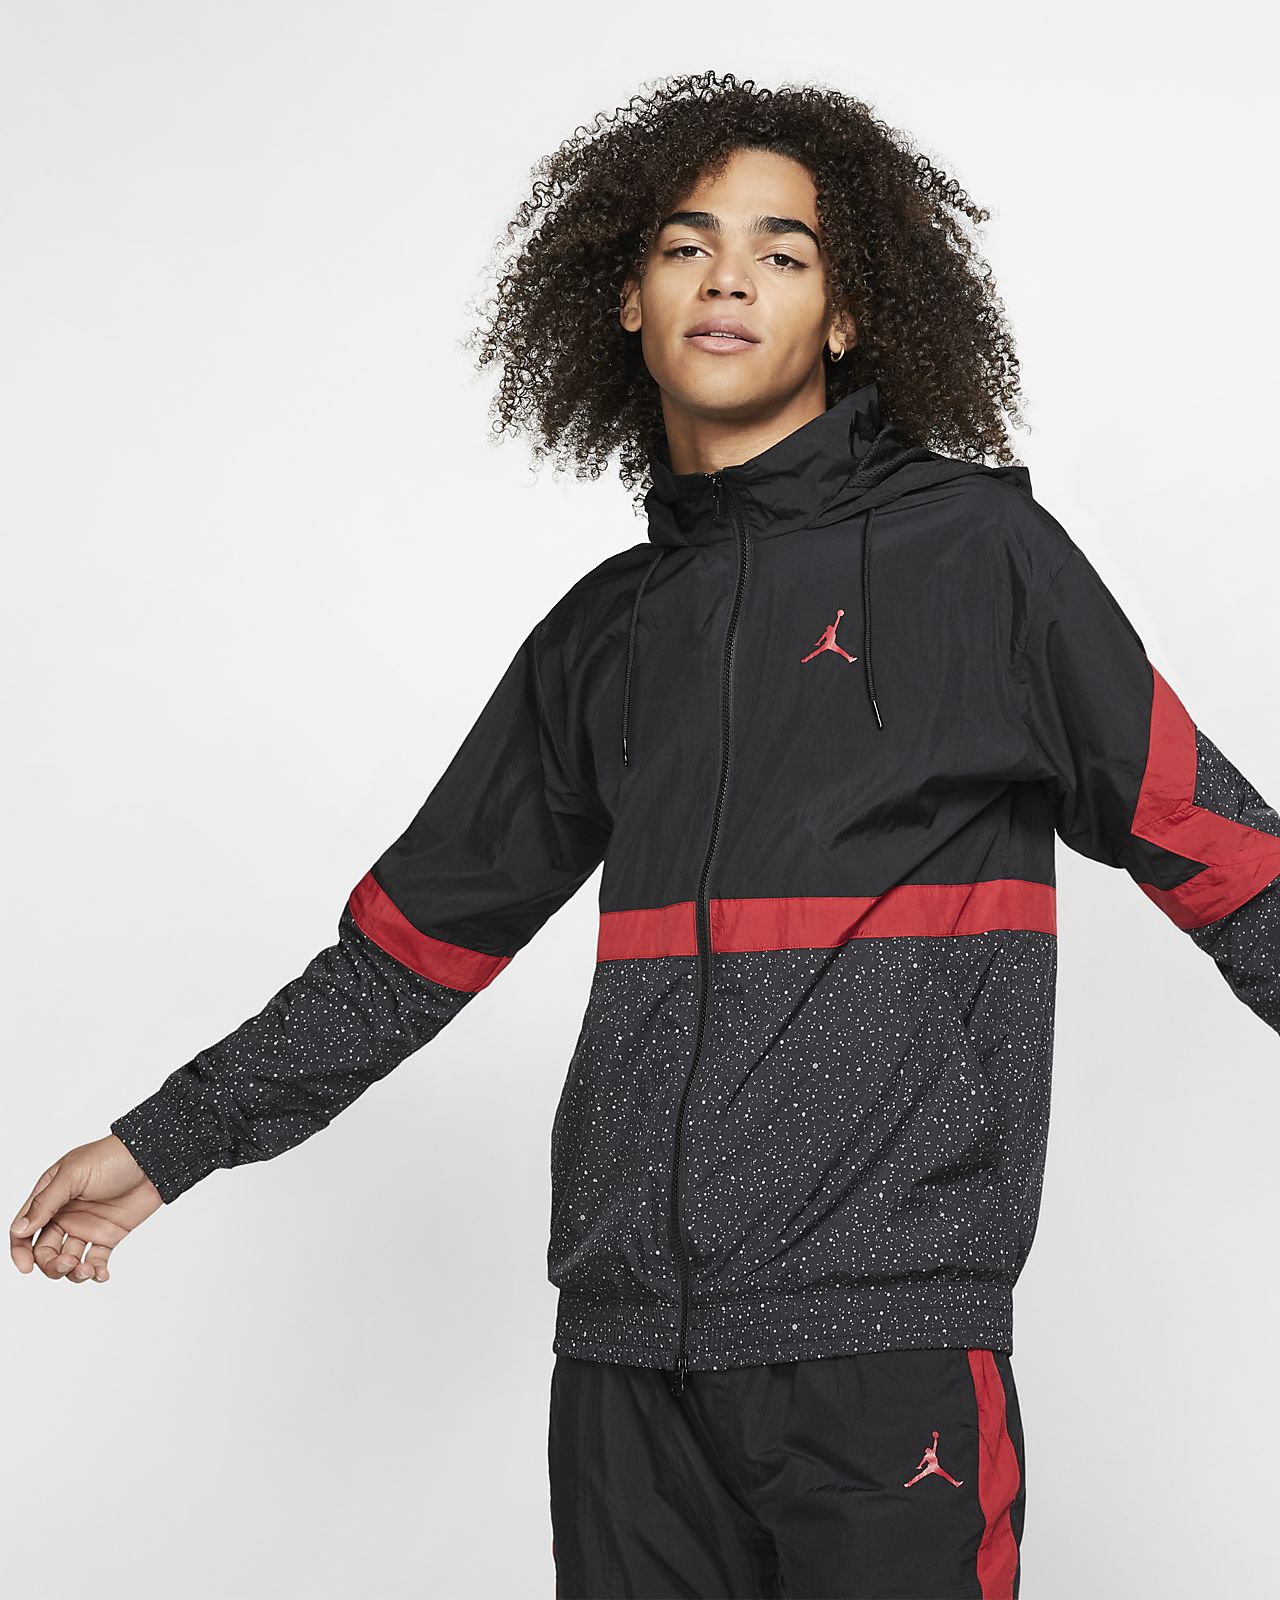 eb59b0bd6 Jordan Diamond Cement Men's Jacket. Nike.com GB